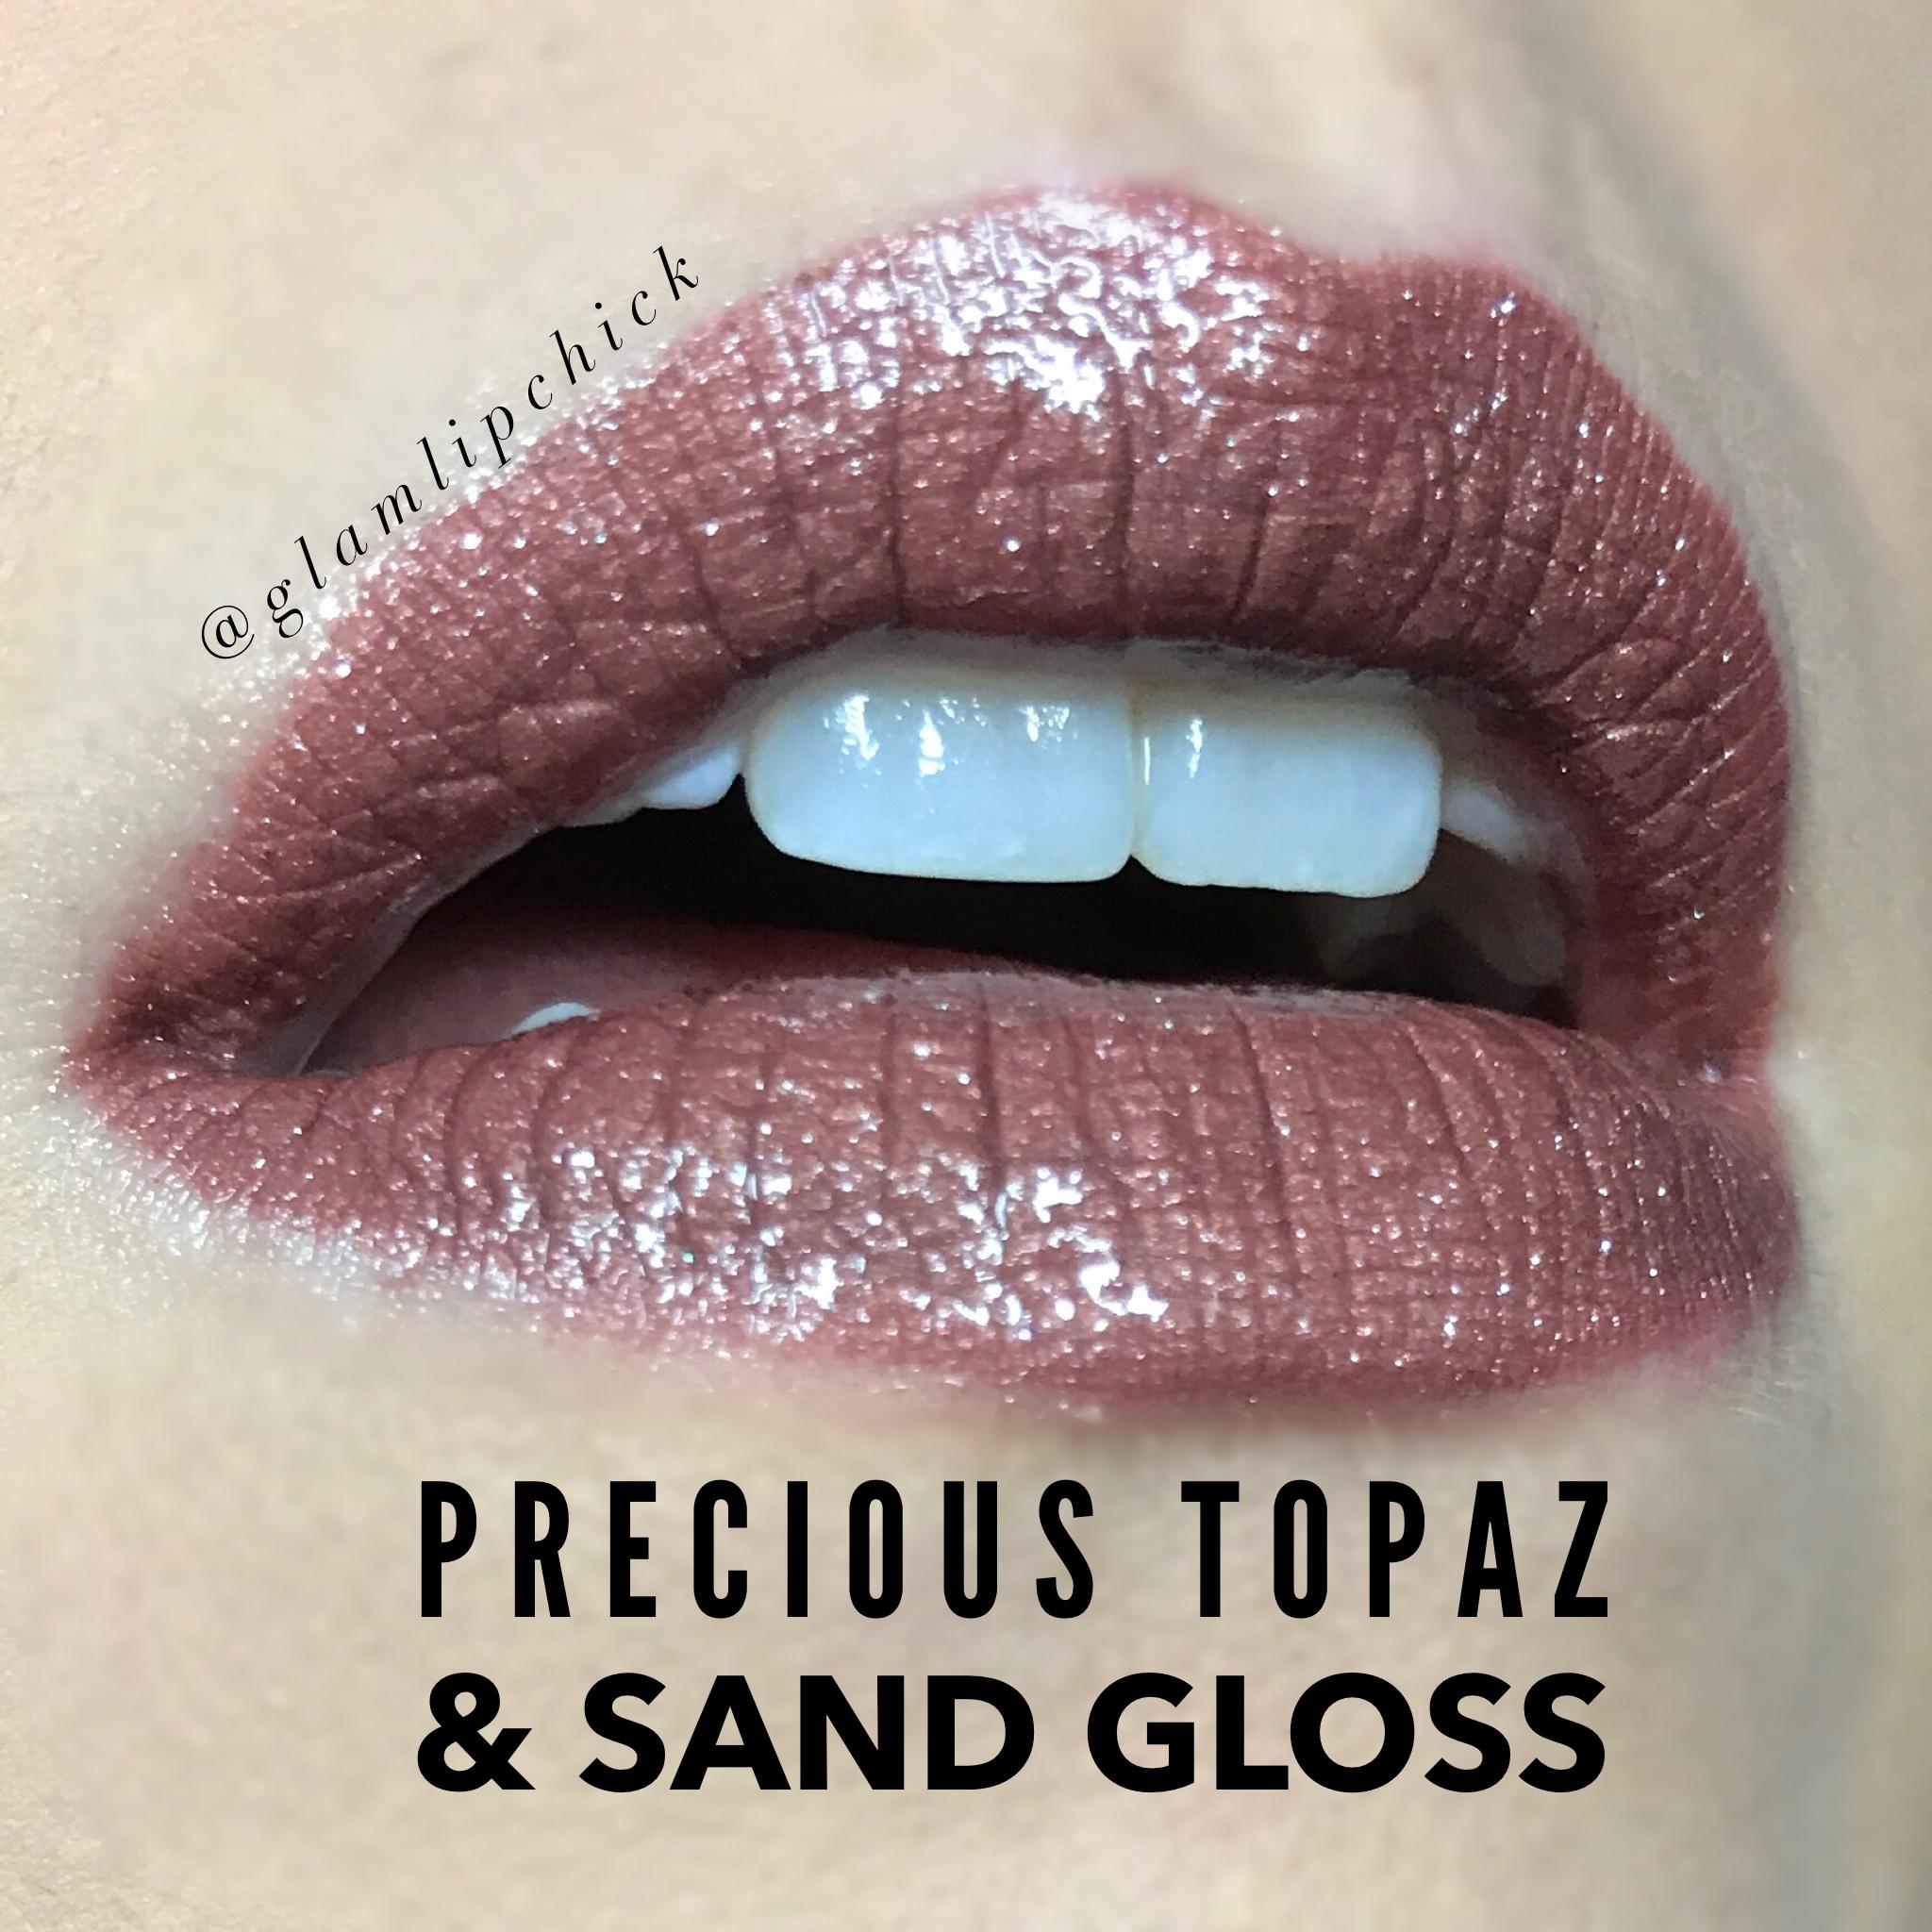 Precious Topaz Lipsense Always Free Shipping At Wwwglamlipchickcom #Precioustopaz #Lipsense